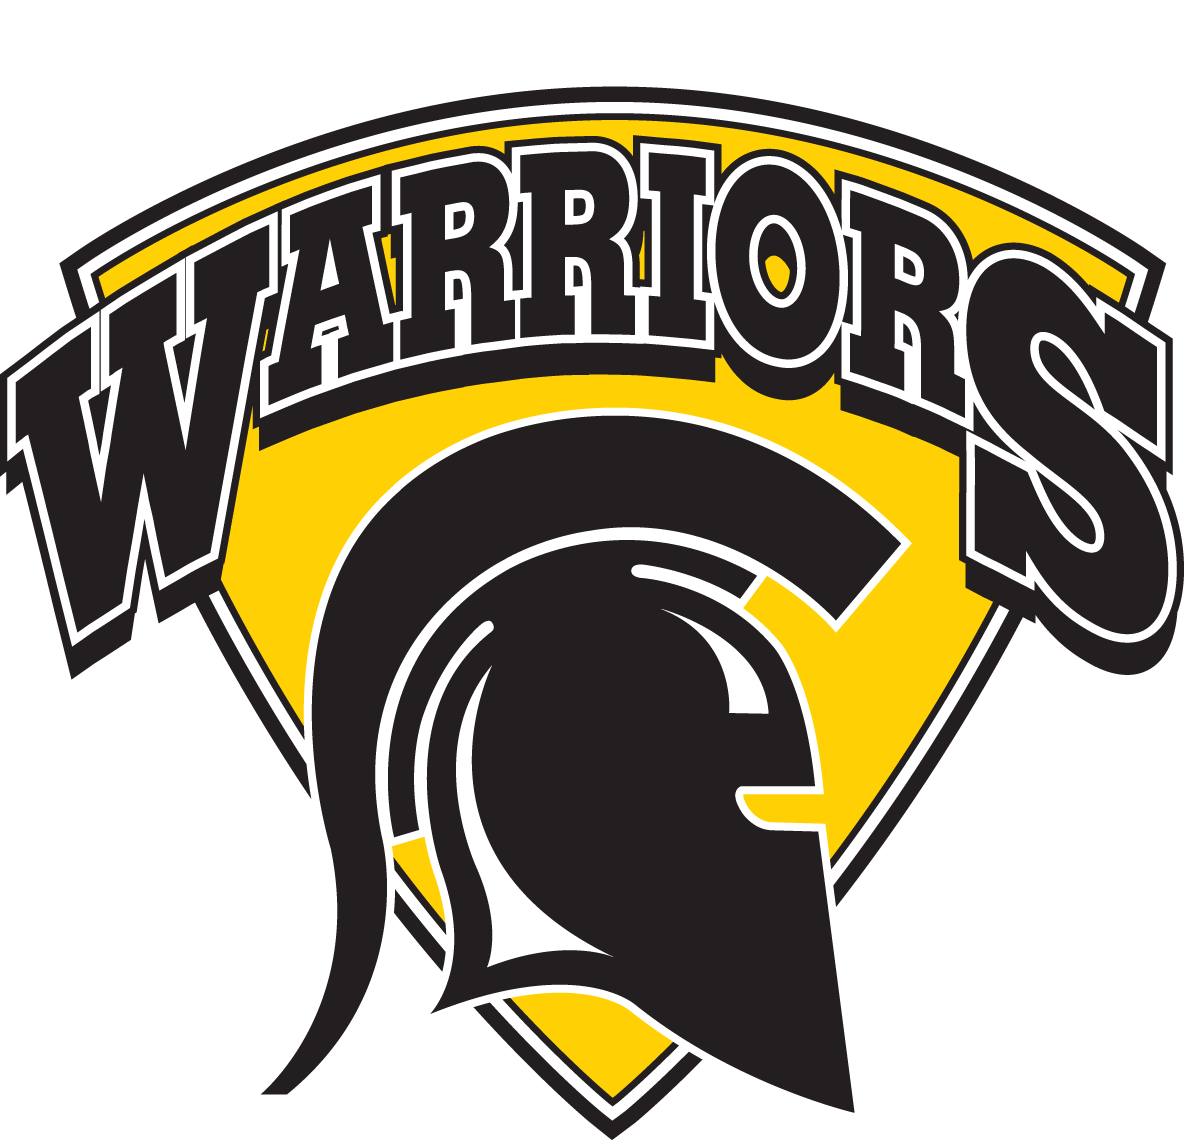 waterloo_logo_alt